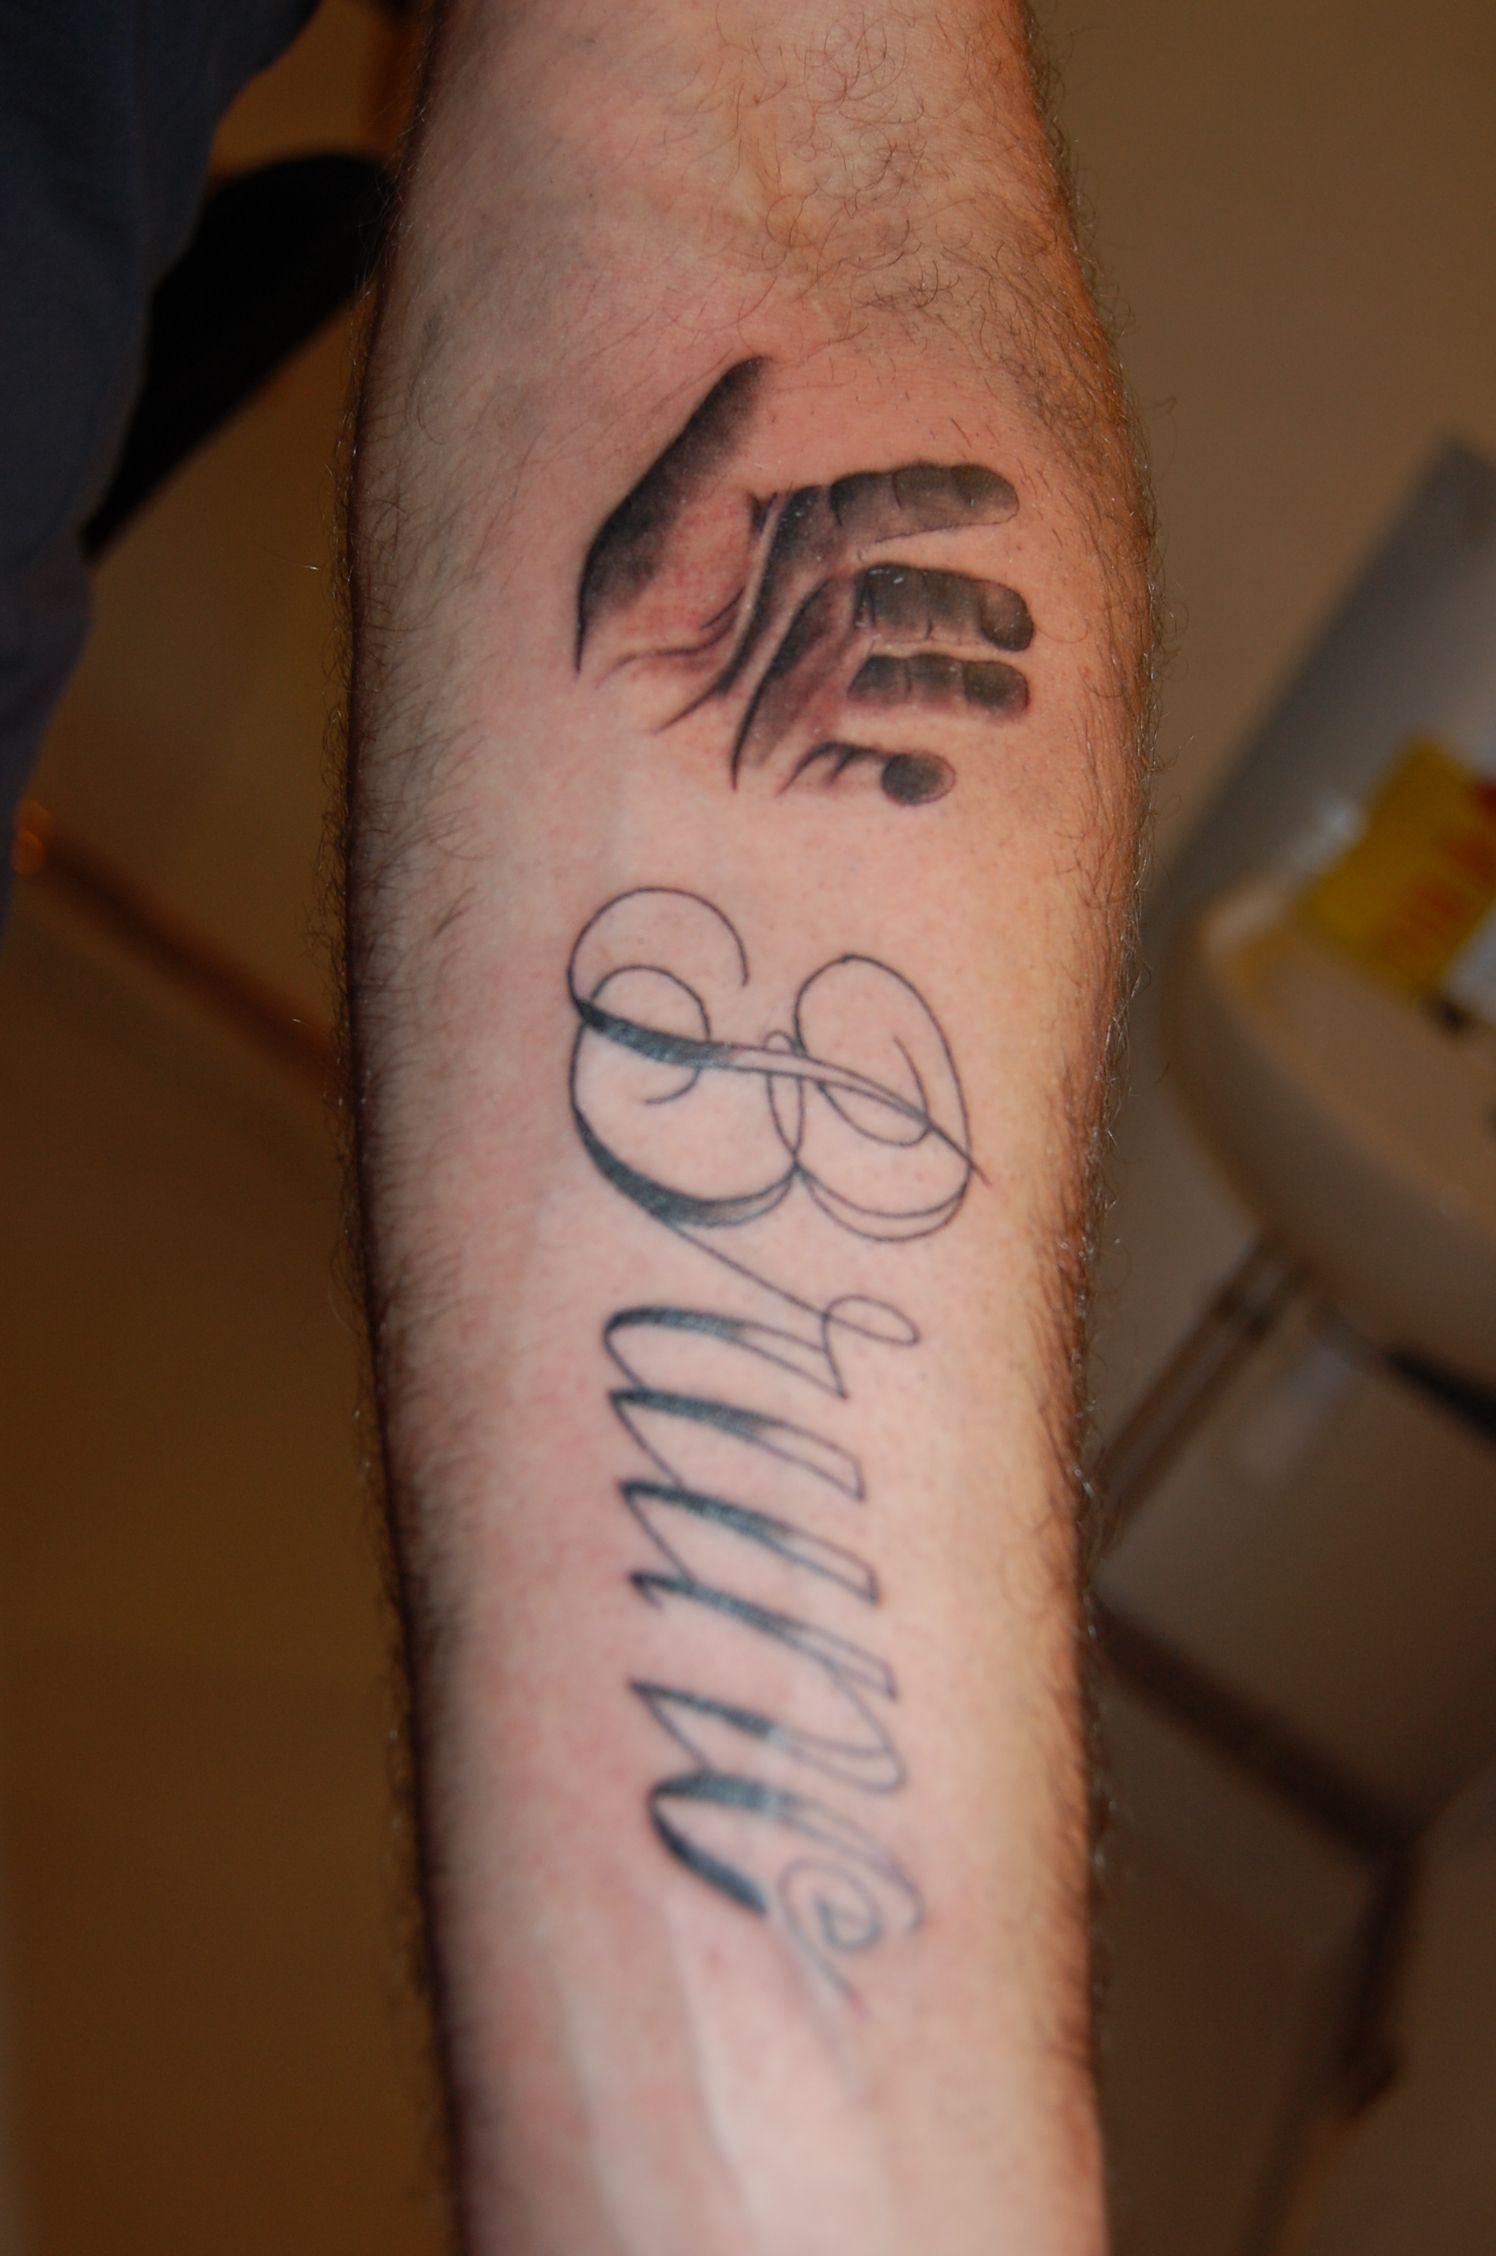 La Huella De Una Vida Nueva Tatuajes Tattoo Quotes Quotes Y Tattoos